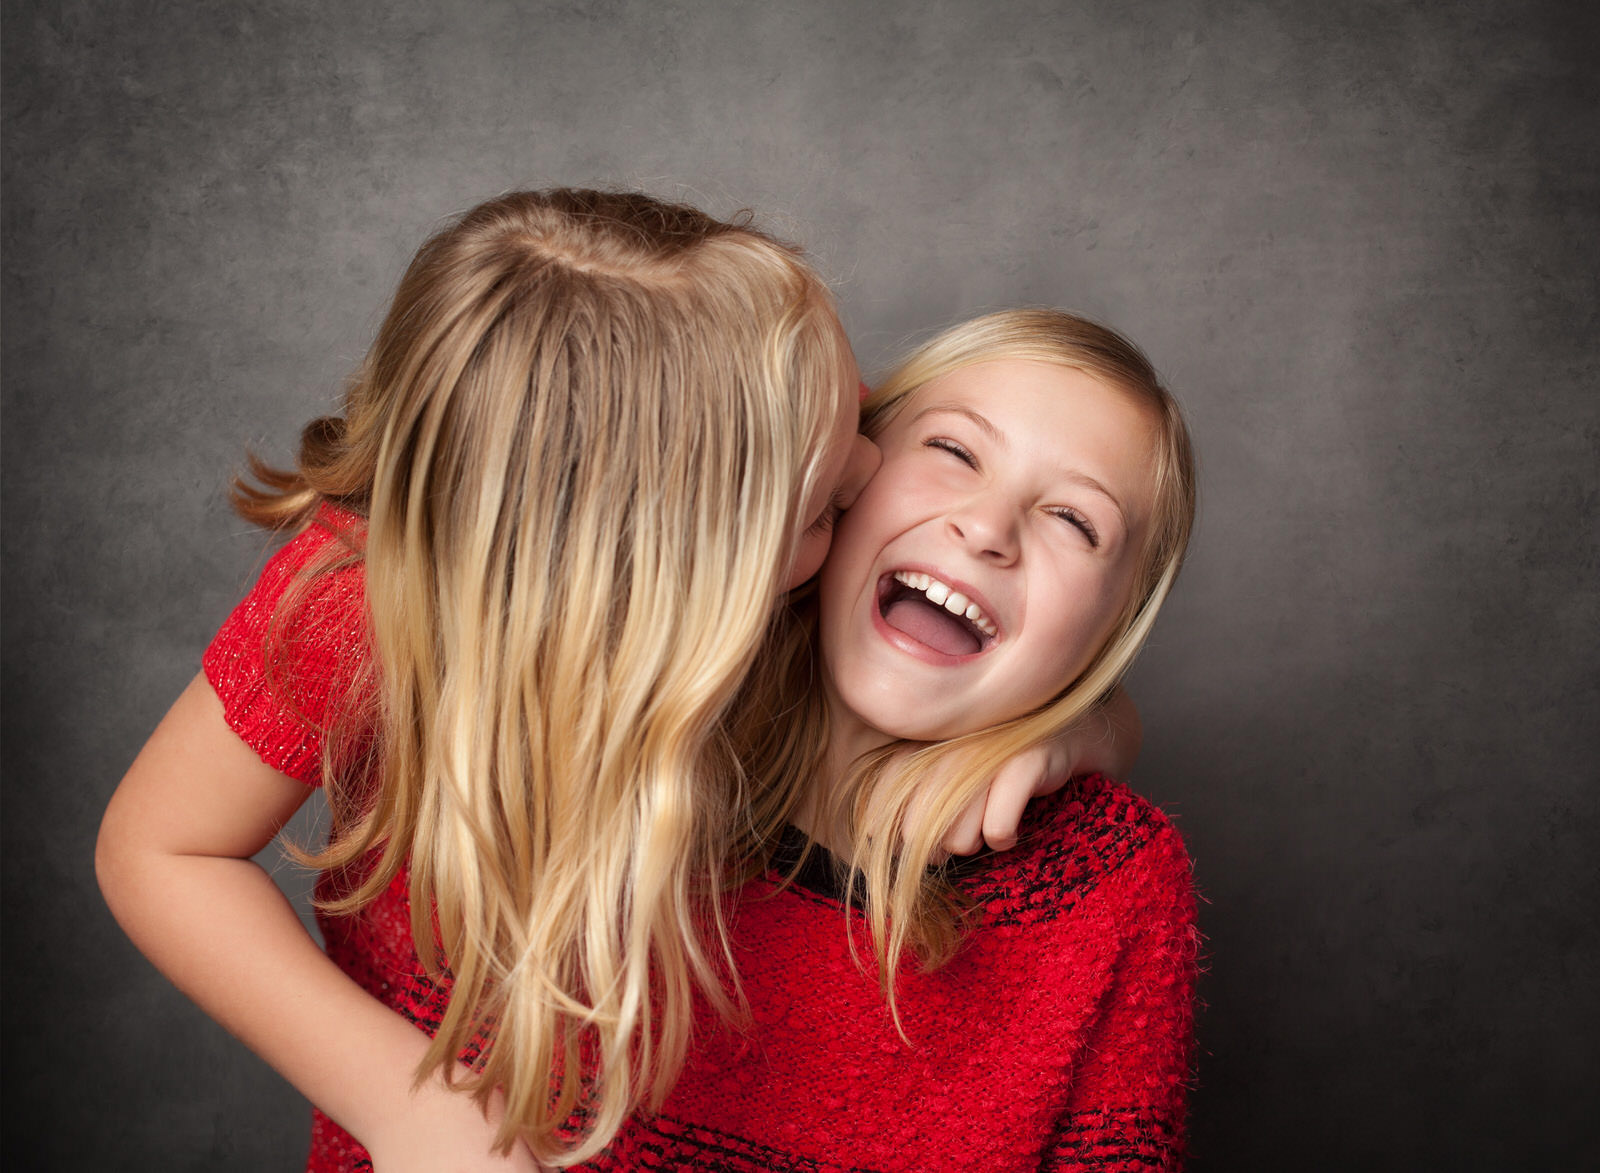 upper-peninsula-photographer-family-children-marquette-michigan-jackie-solomon-006.jpg